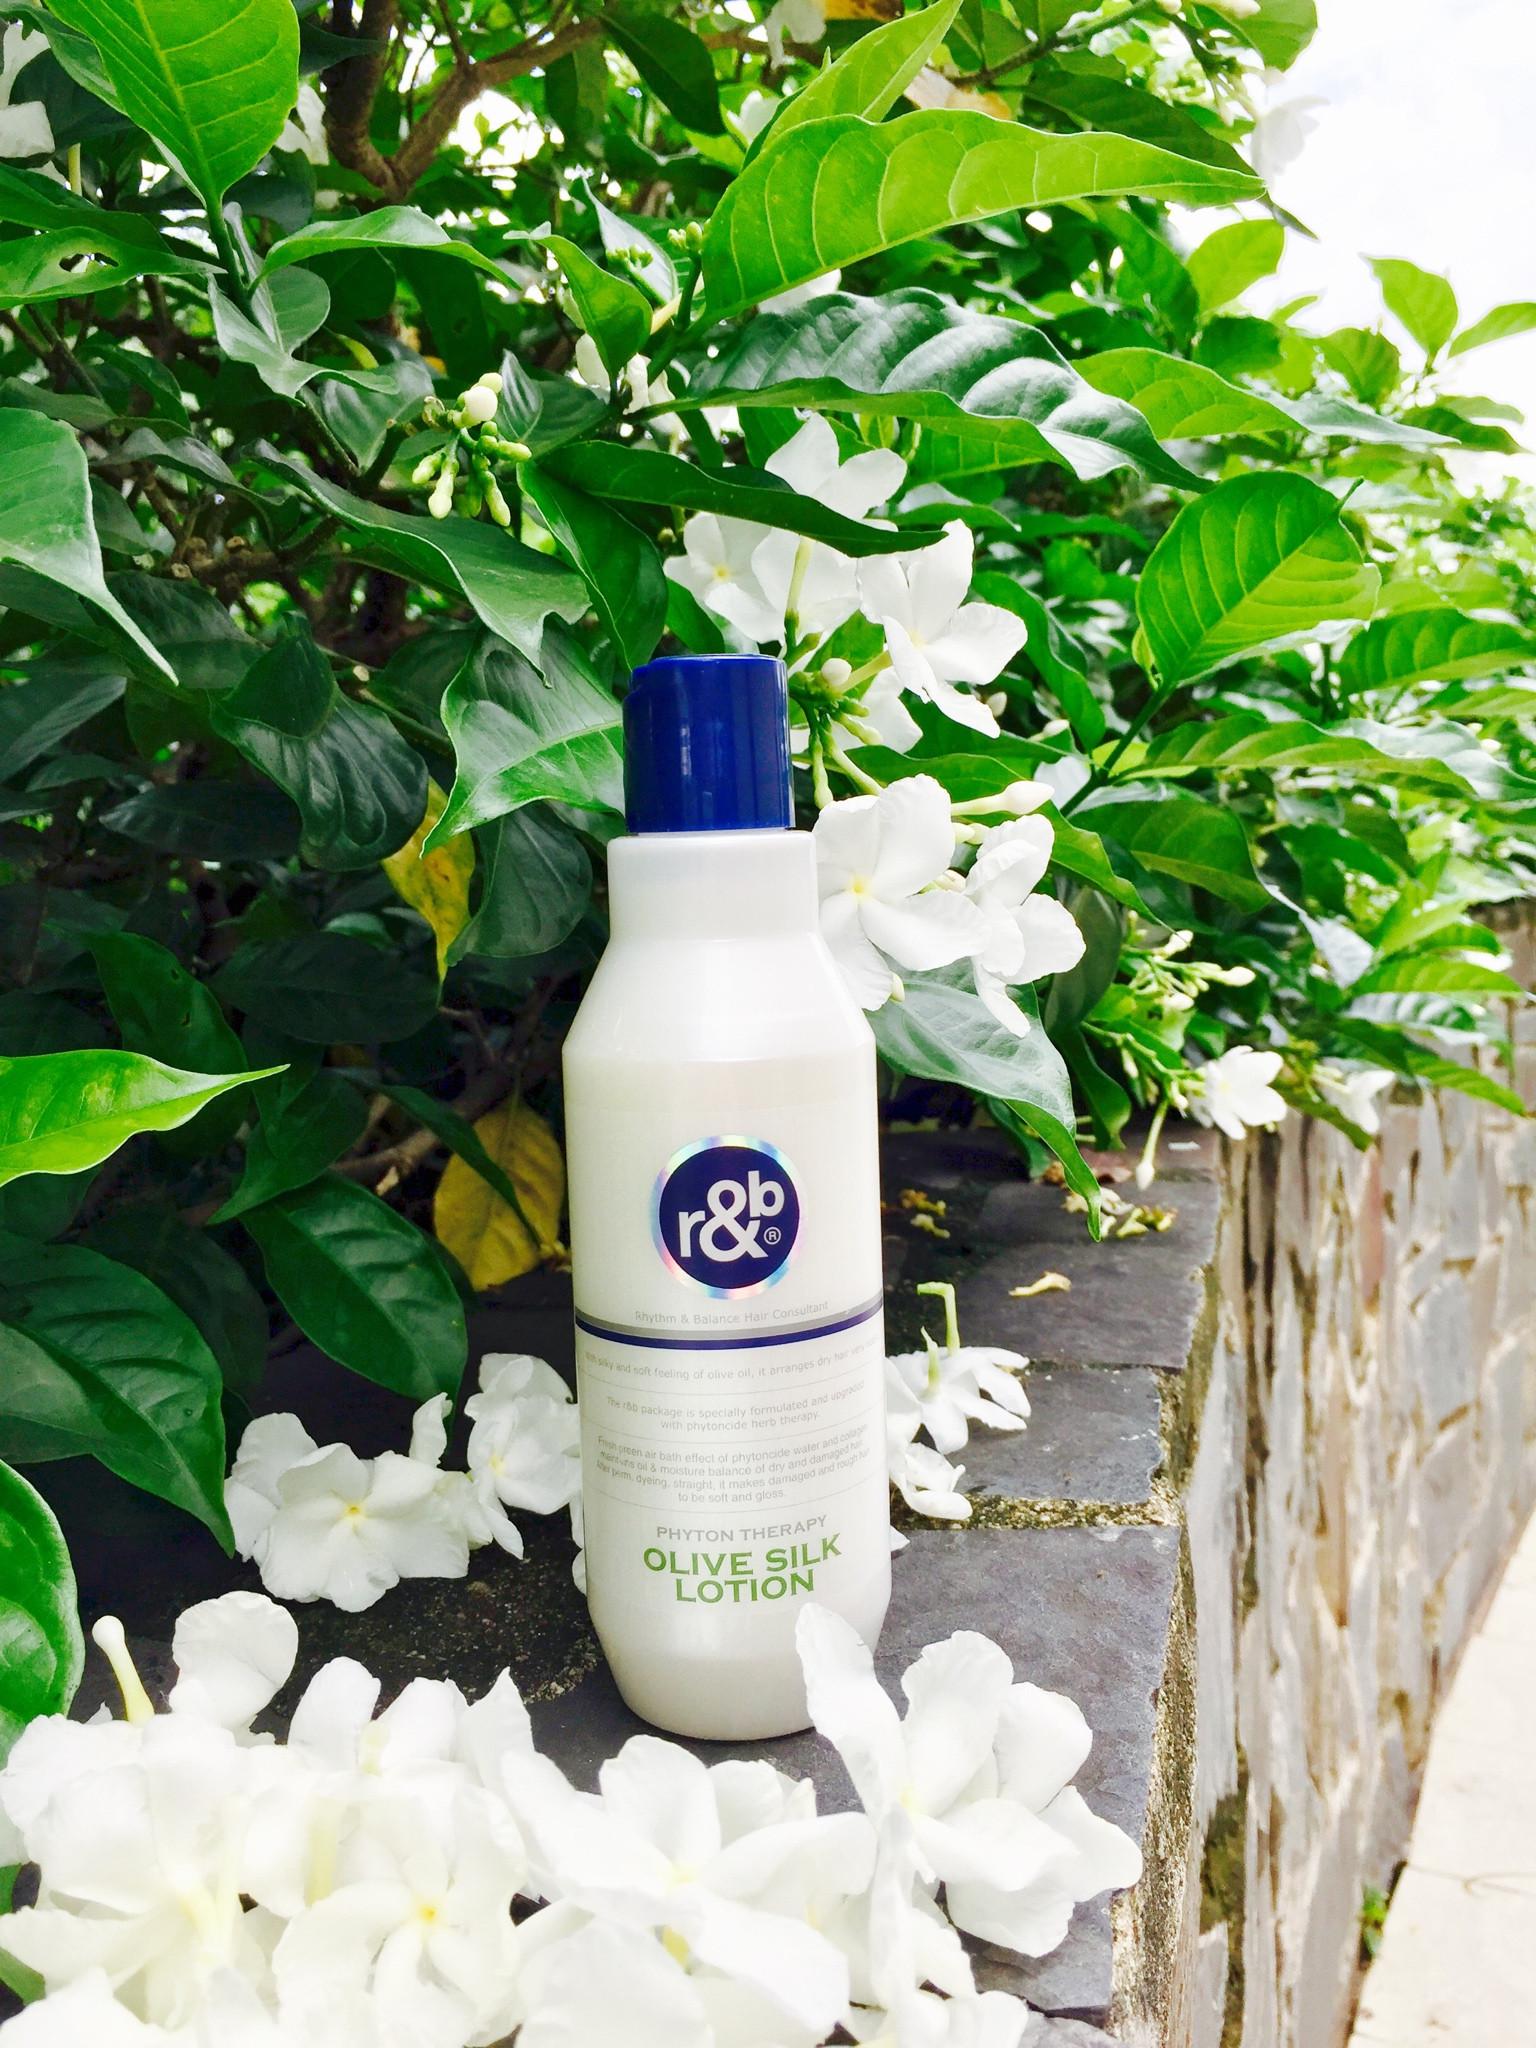 Kem dinh dưỡng bóng tóc R&B Olive Silk Lotion 250ml